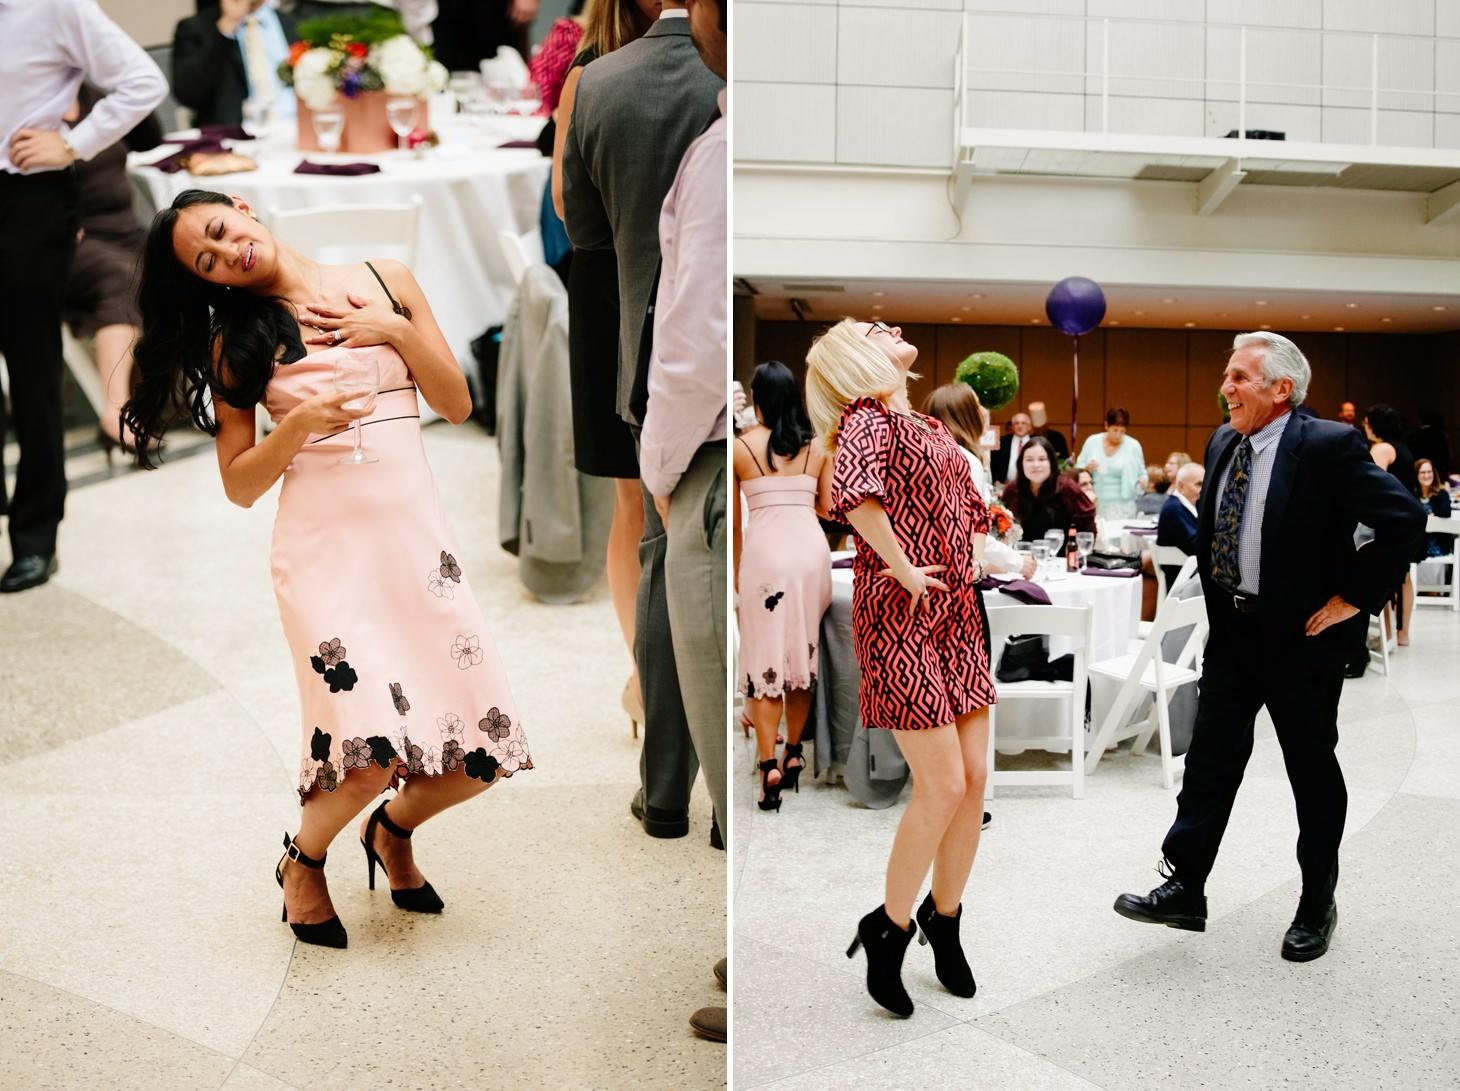 100-nyc-wedding-photographer-hoboken-waterfront-wedding-photos-smitten-chickens.jpg